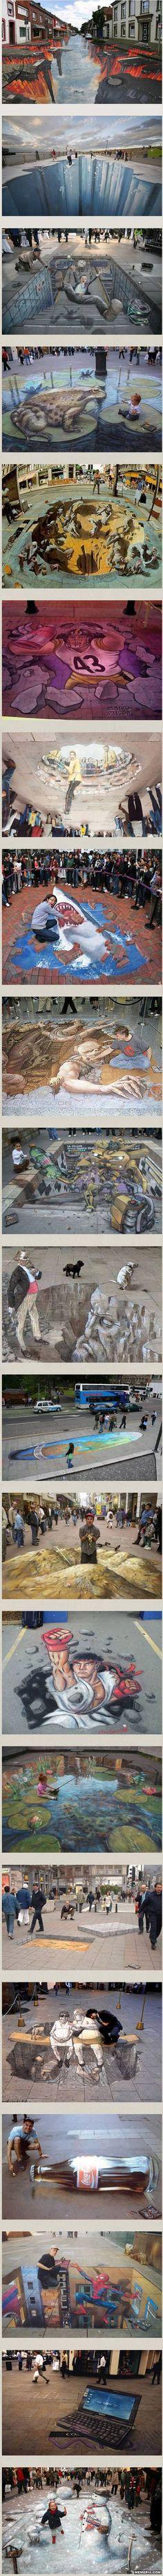 Sidewalk Chalk Art #chalkart #art #chalk